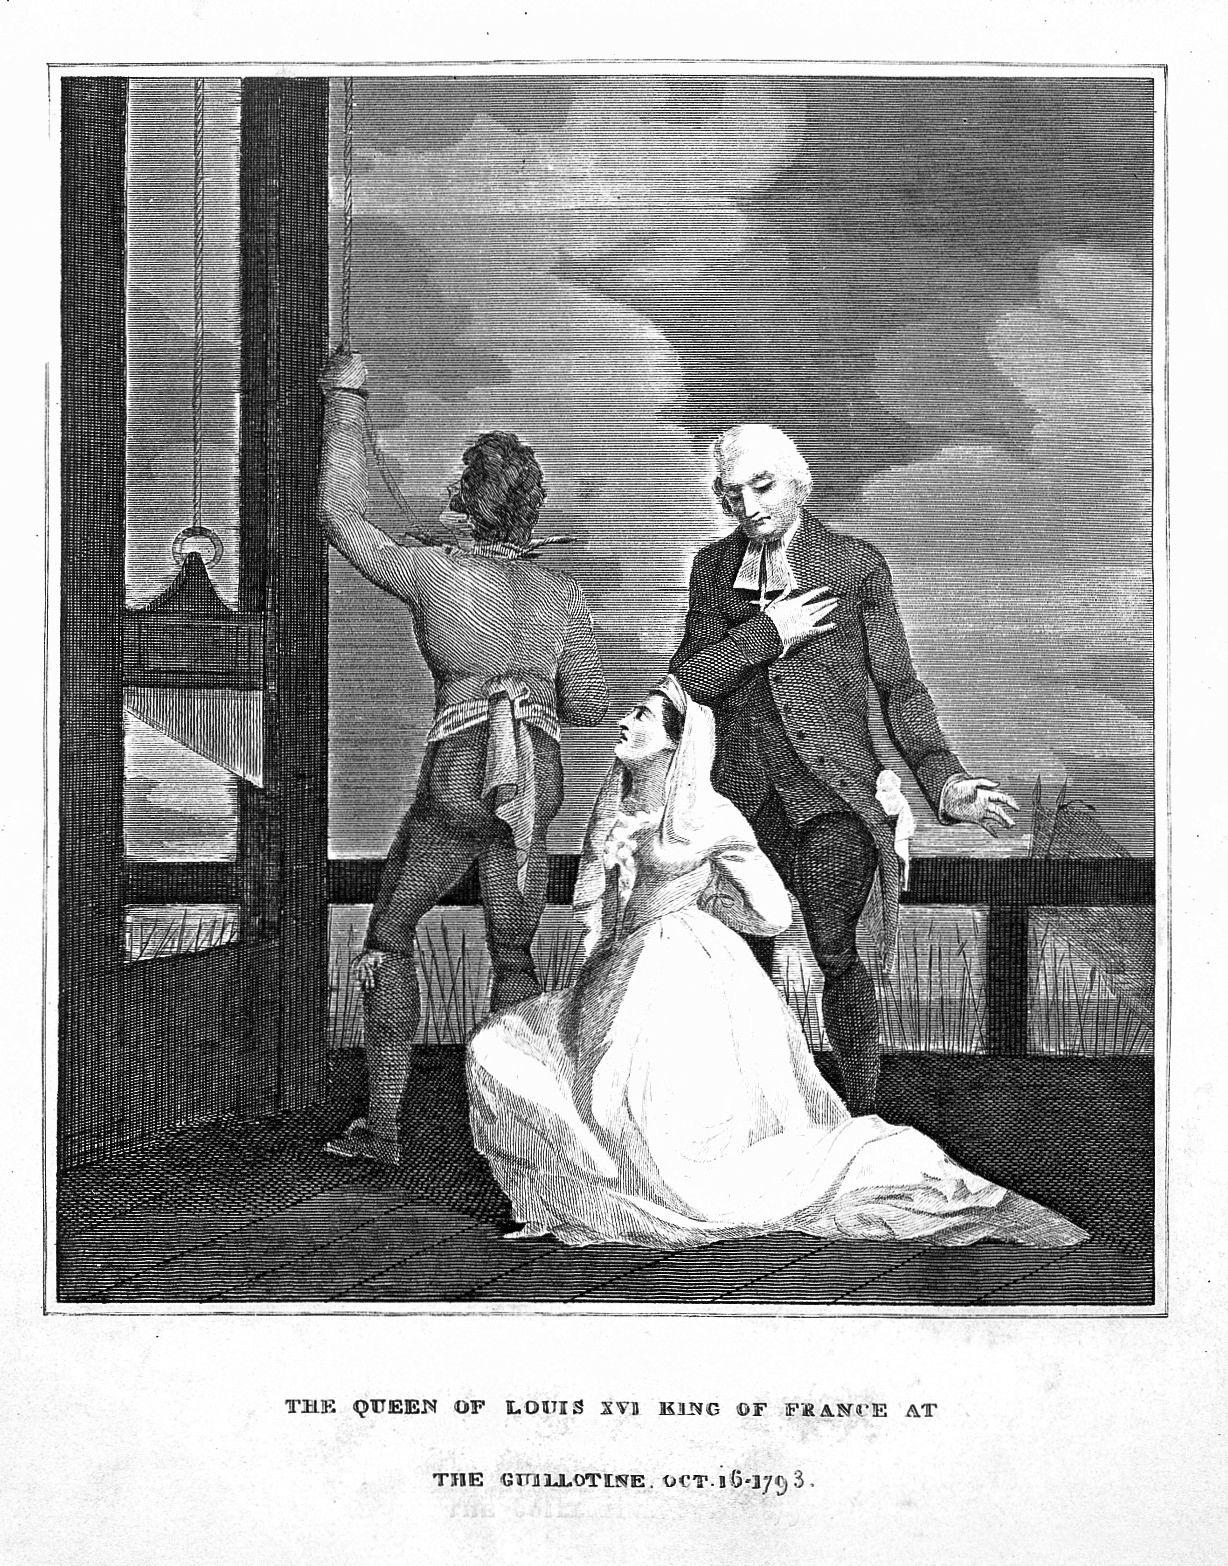 Marie Antoinette Queen Of France Kneeling Before The